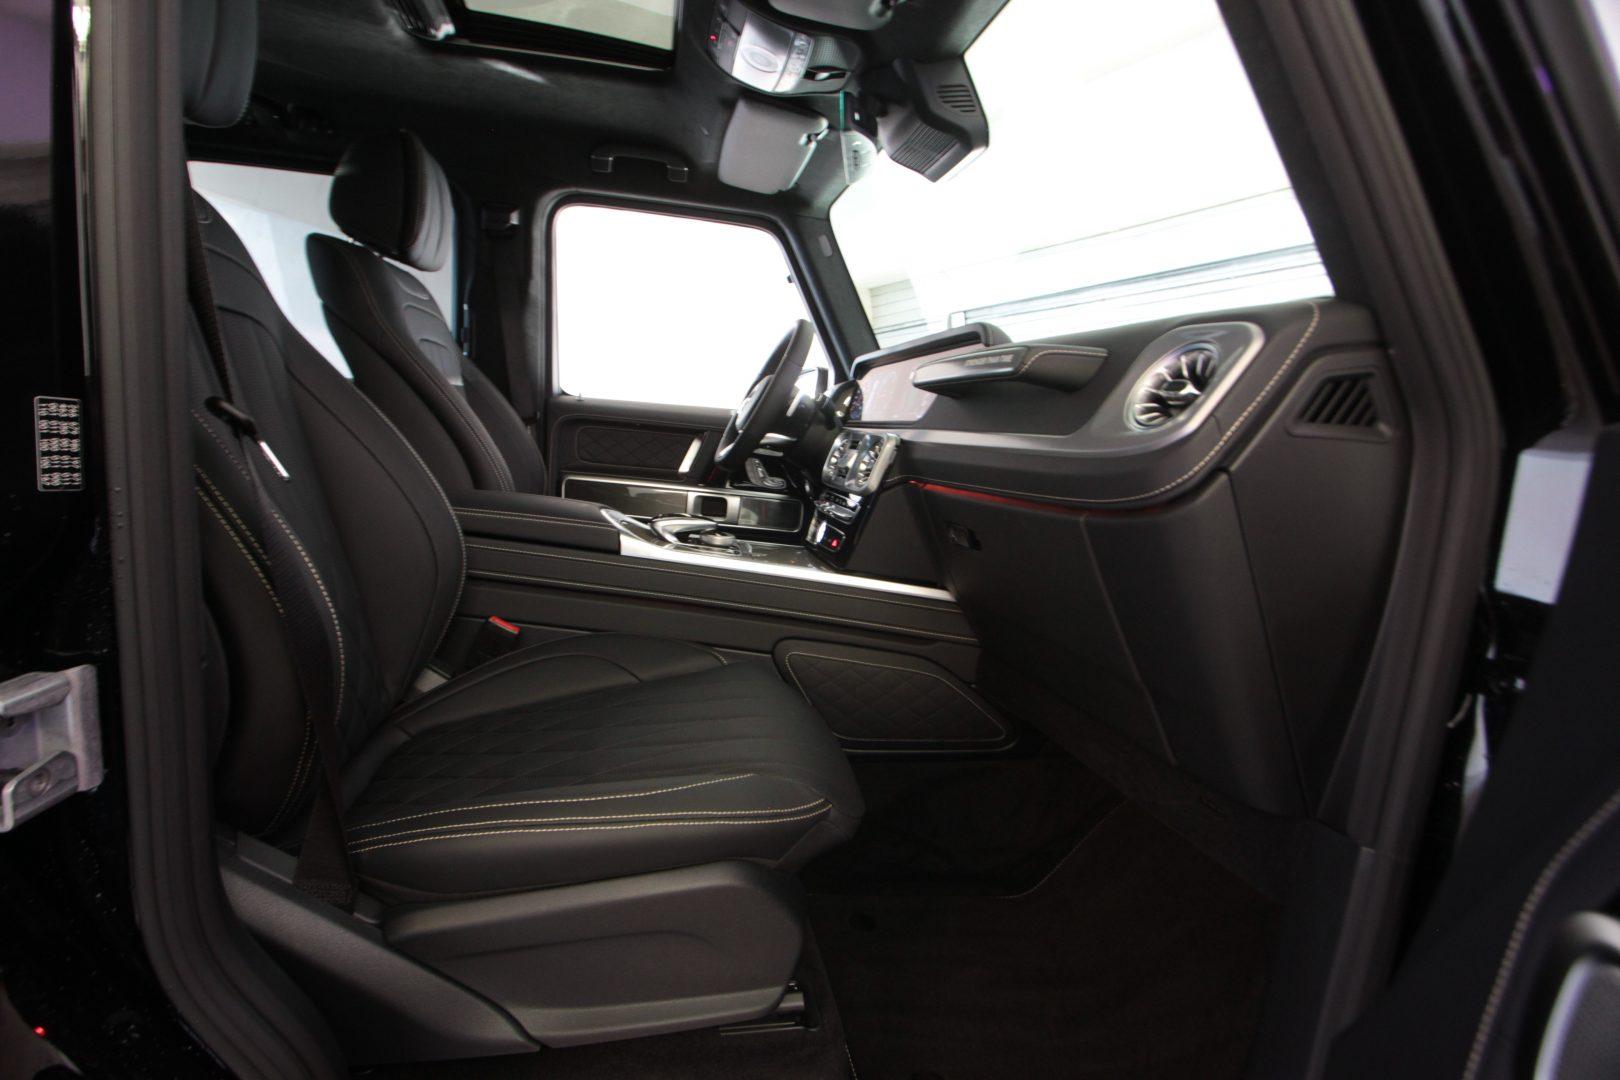 AIL Mercedes-Benz G 400 d Stronger than time Edition 13